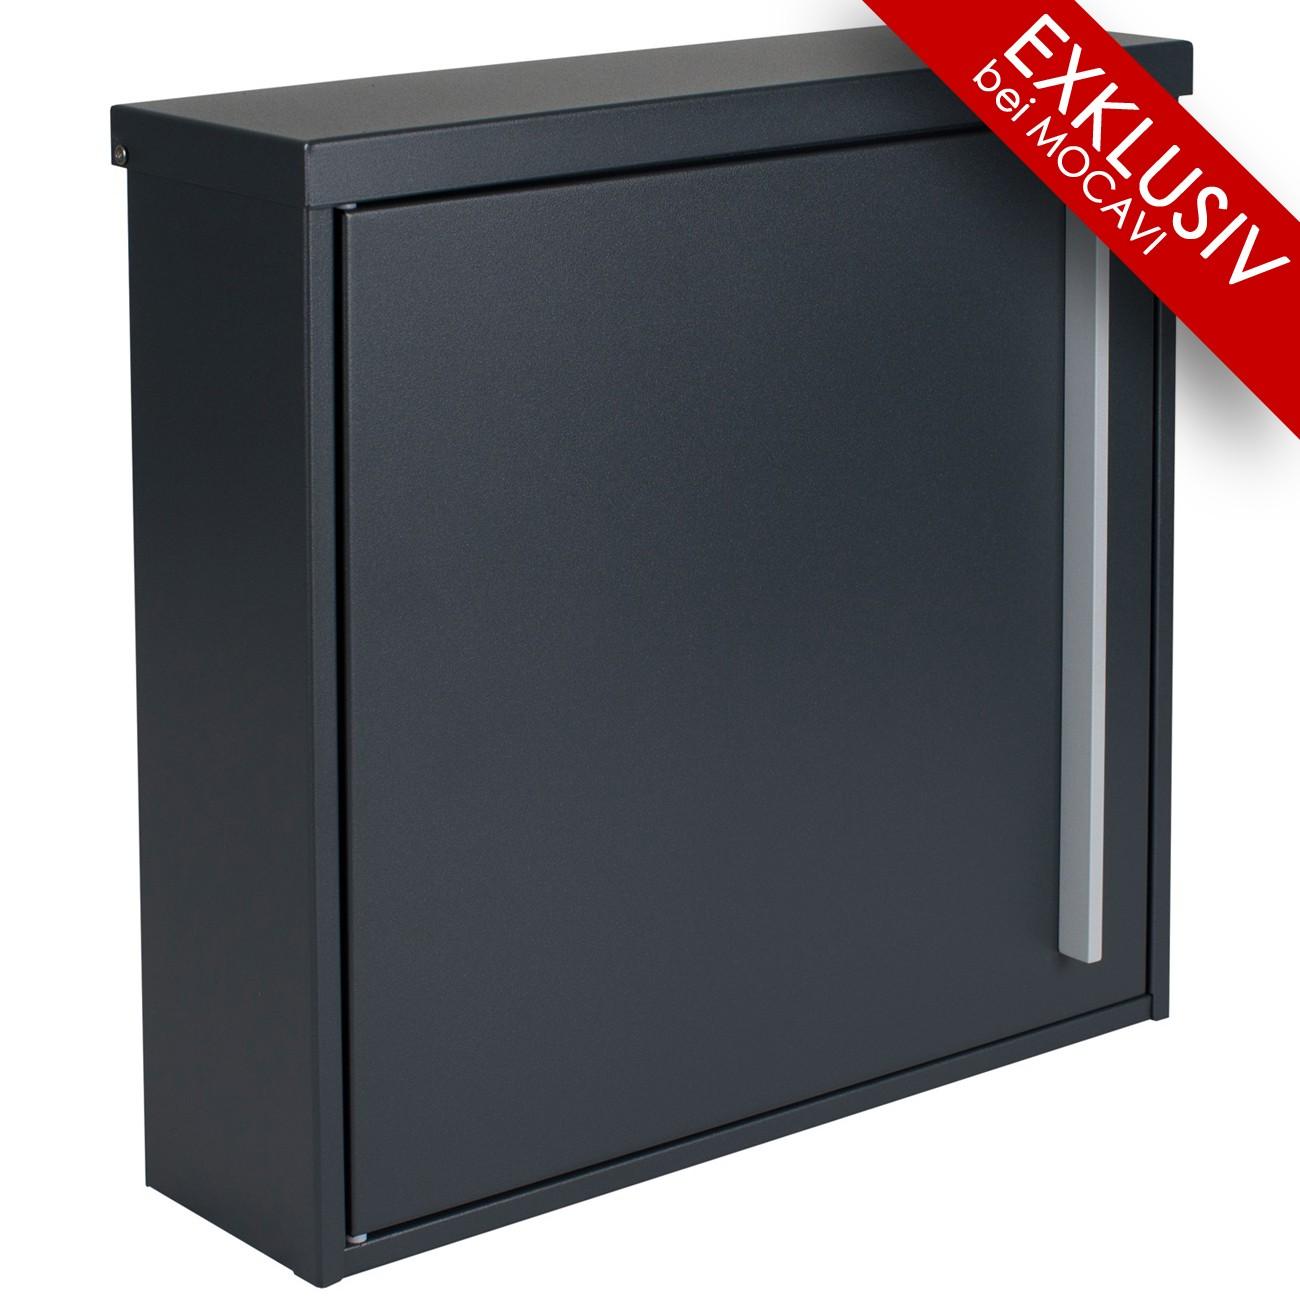 briefkasten mocavi box 101 anthrazitgrau ral 7016 grau 12 liter wandbriefkasten eingang. Black Bedroom Furniture Sets. Home Design Ideas